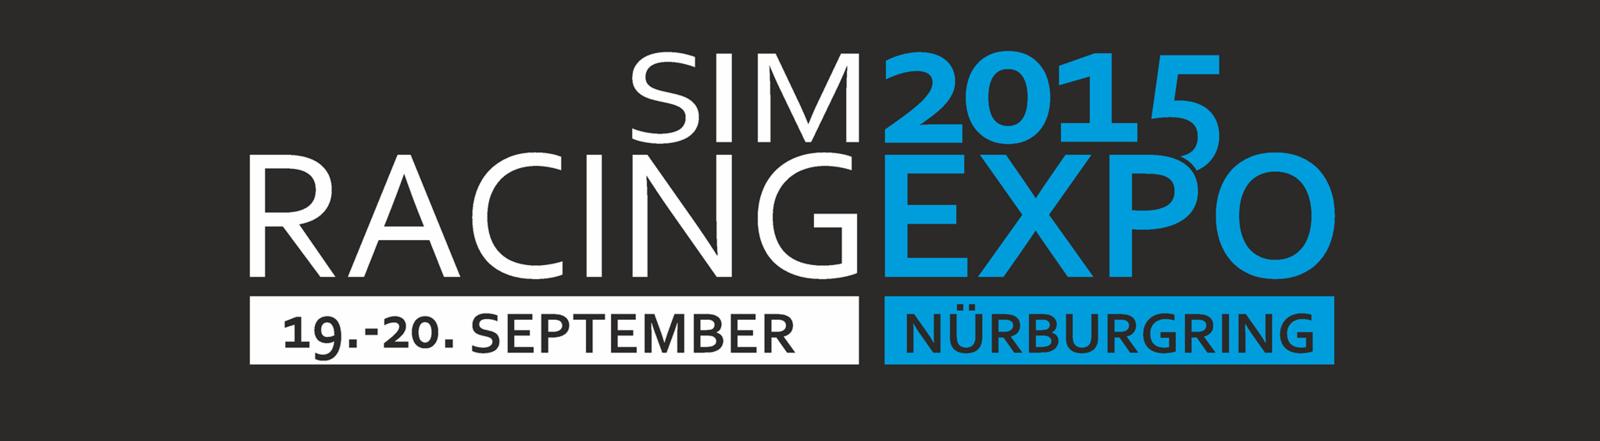 GSCE- Rallycross (Simracing EXPO 2015)